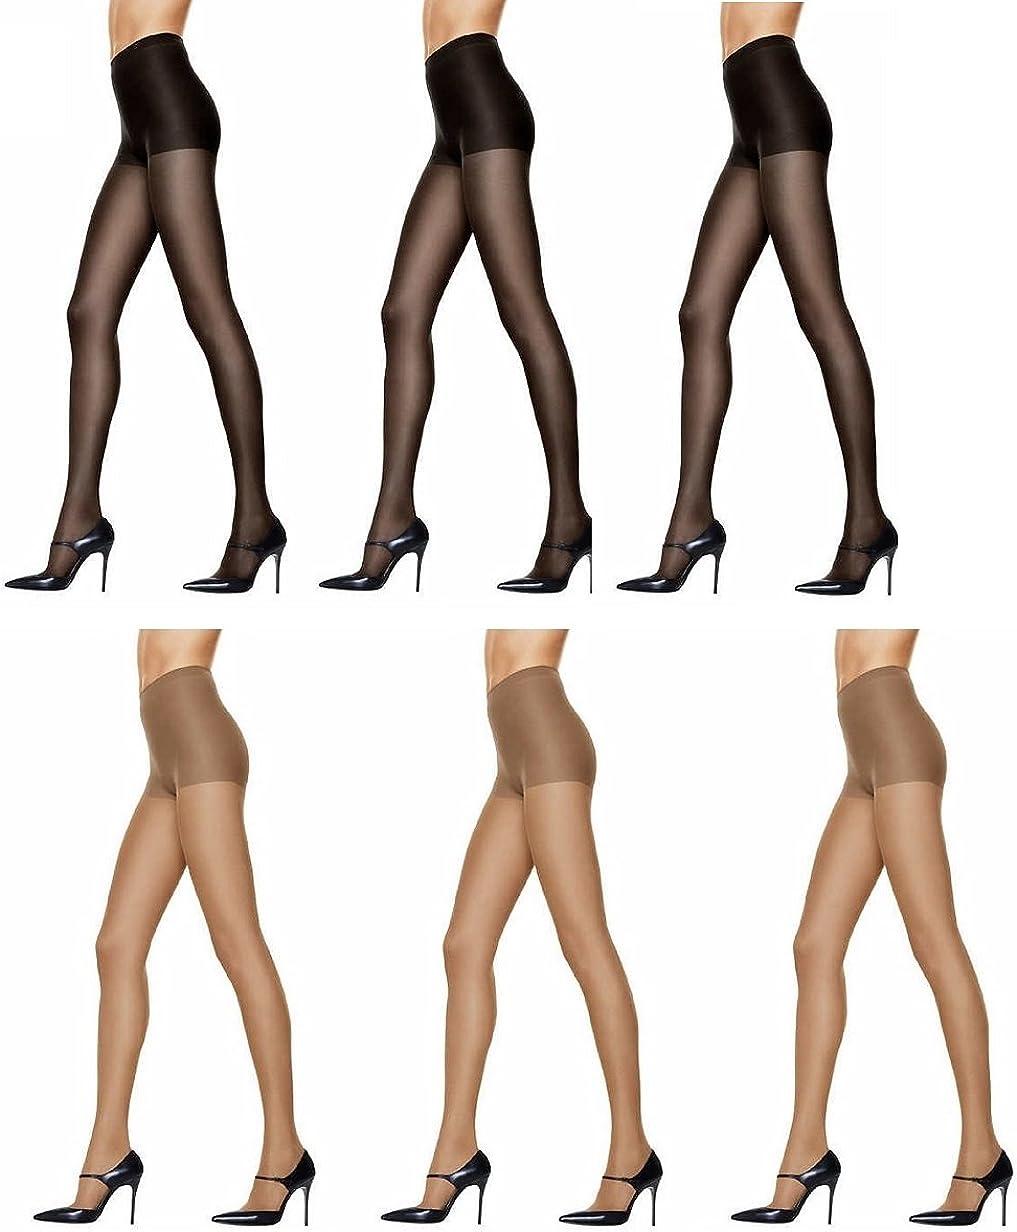 Hanes Women's Silk Reflections Control Top Pantyhose (3 Par Black - 3 Pair Sheer)